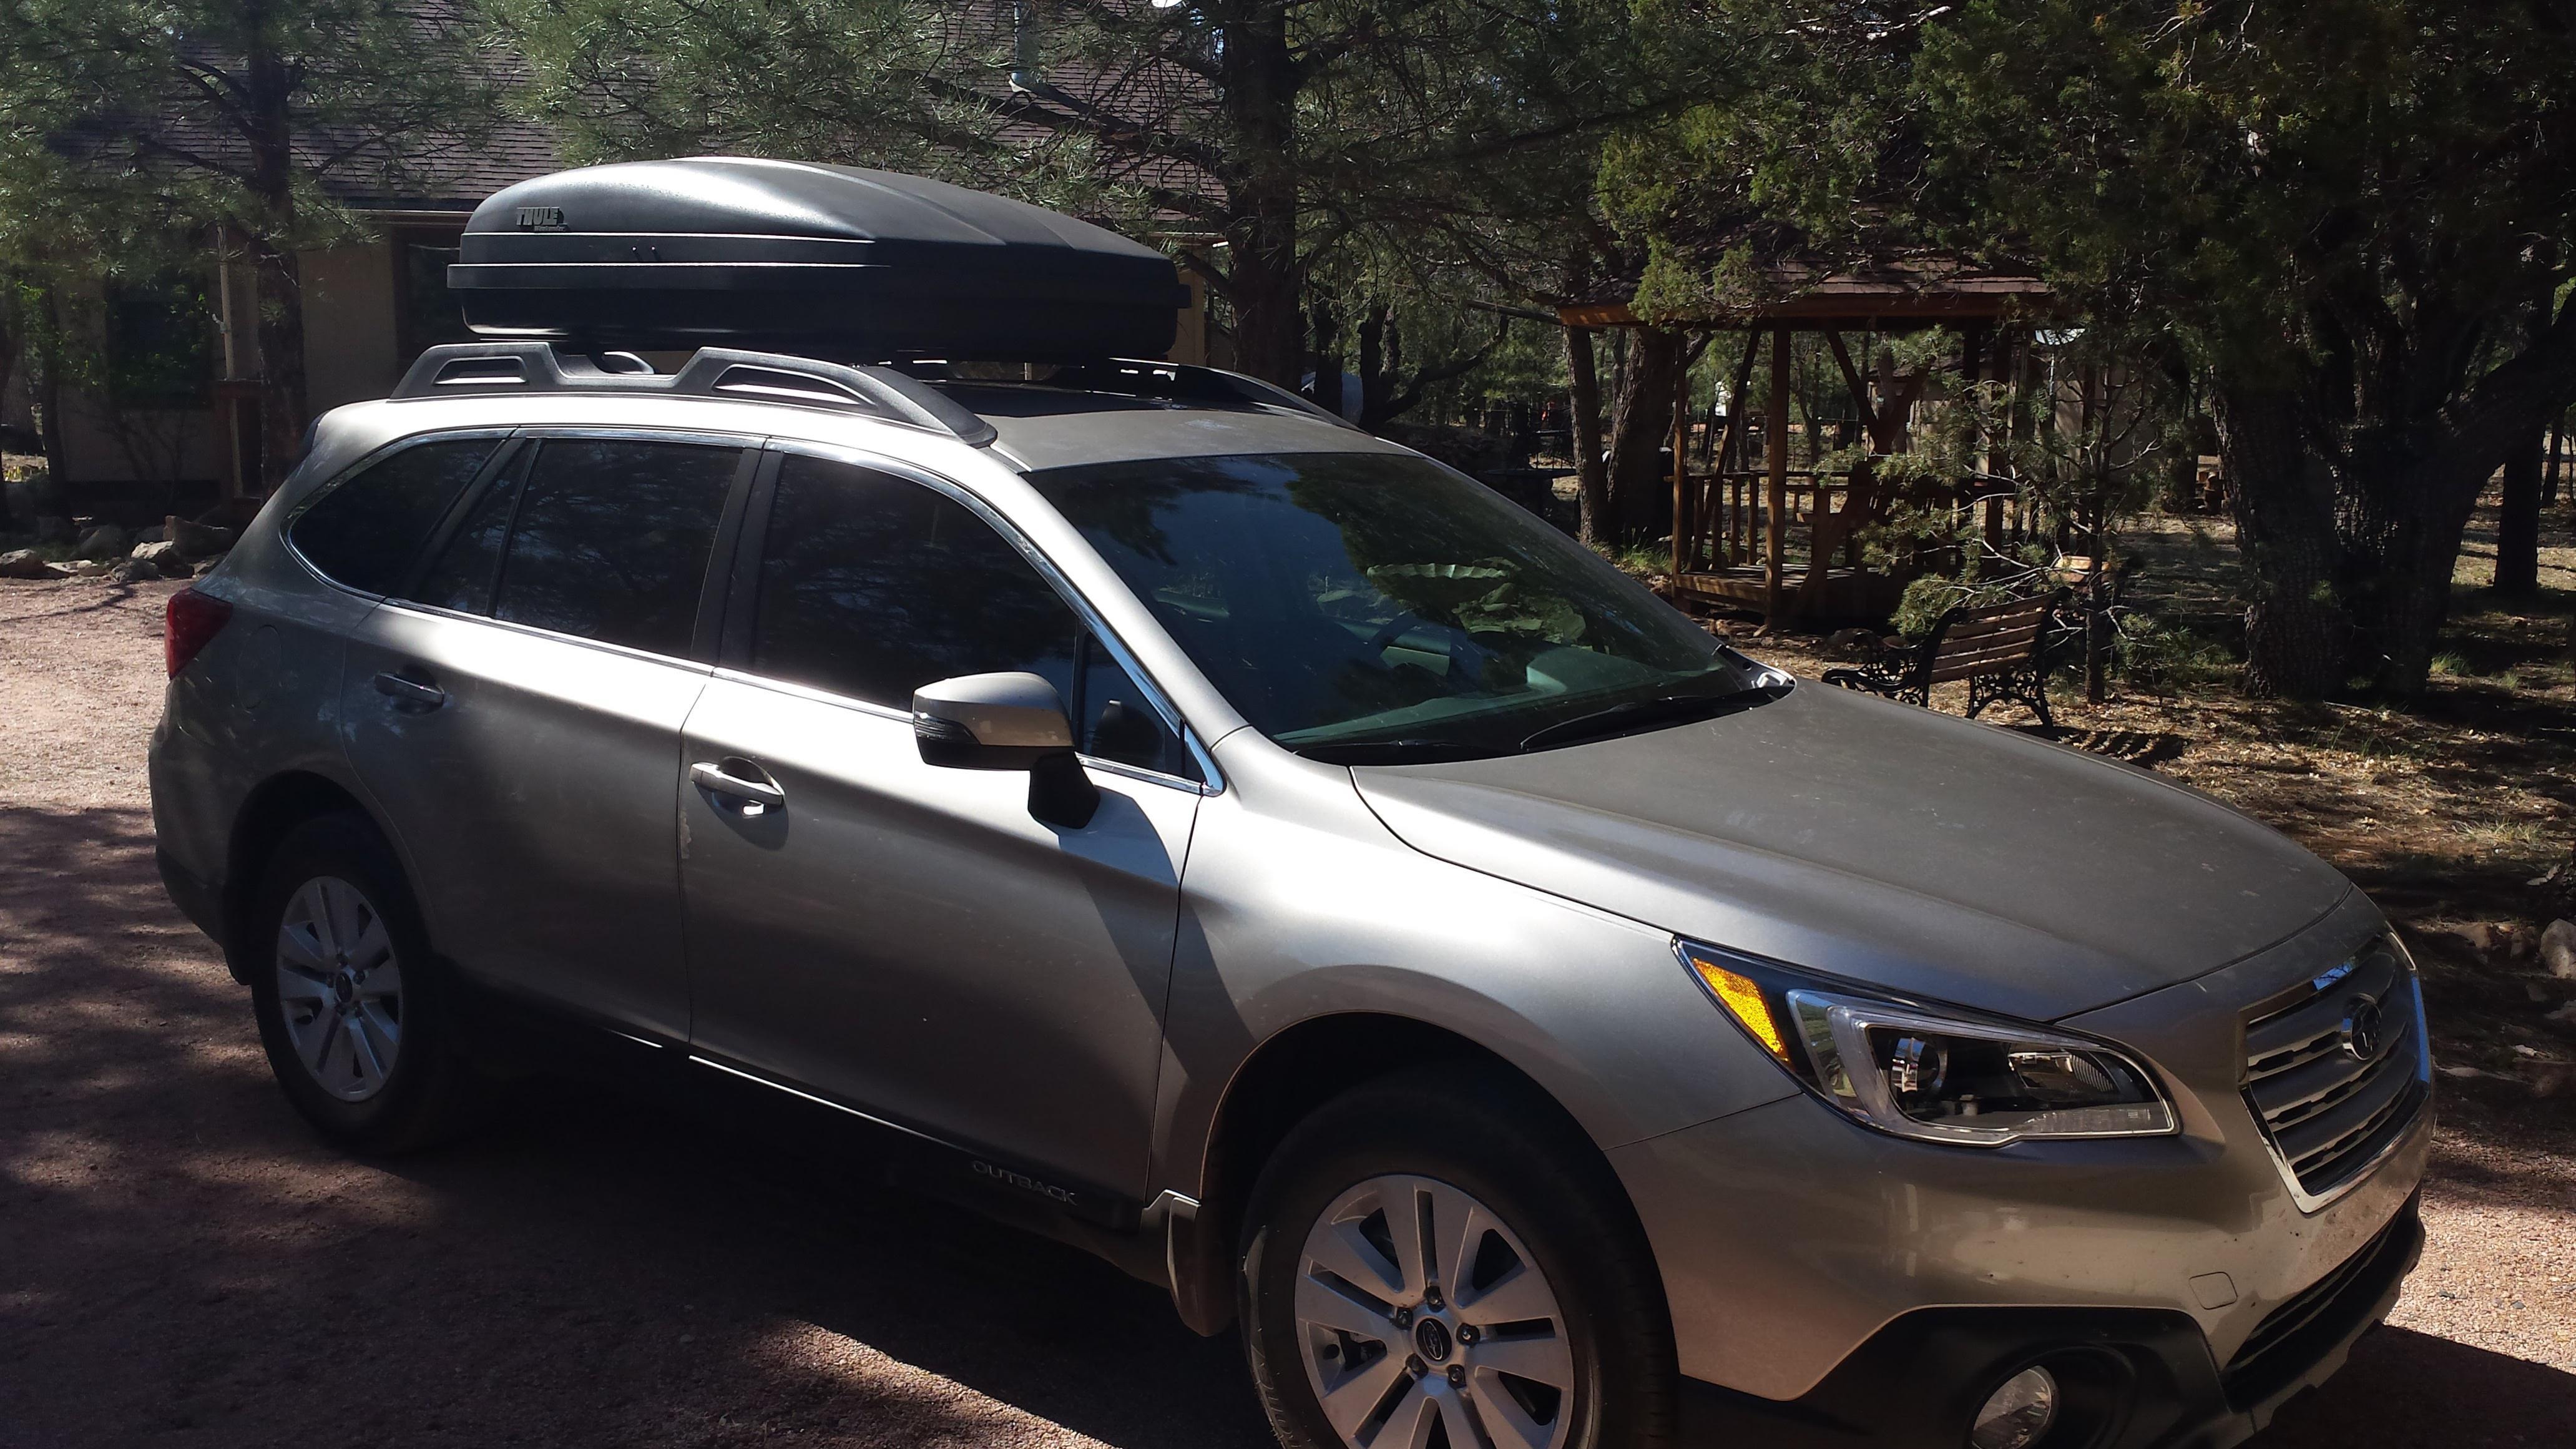 Thule Roof Rack For Subaru Outback 2017 Racks Blog Ideas